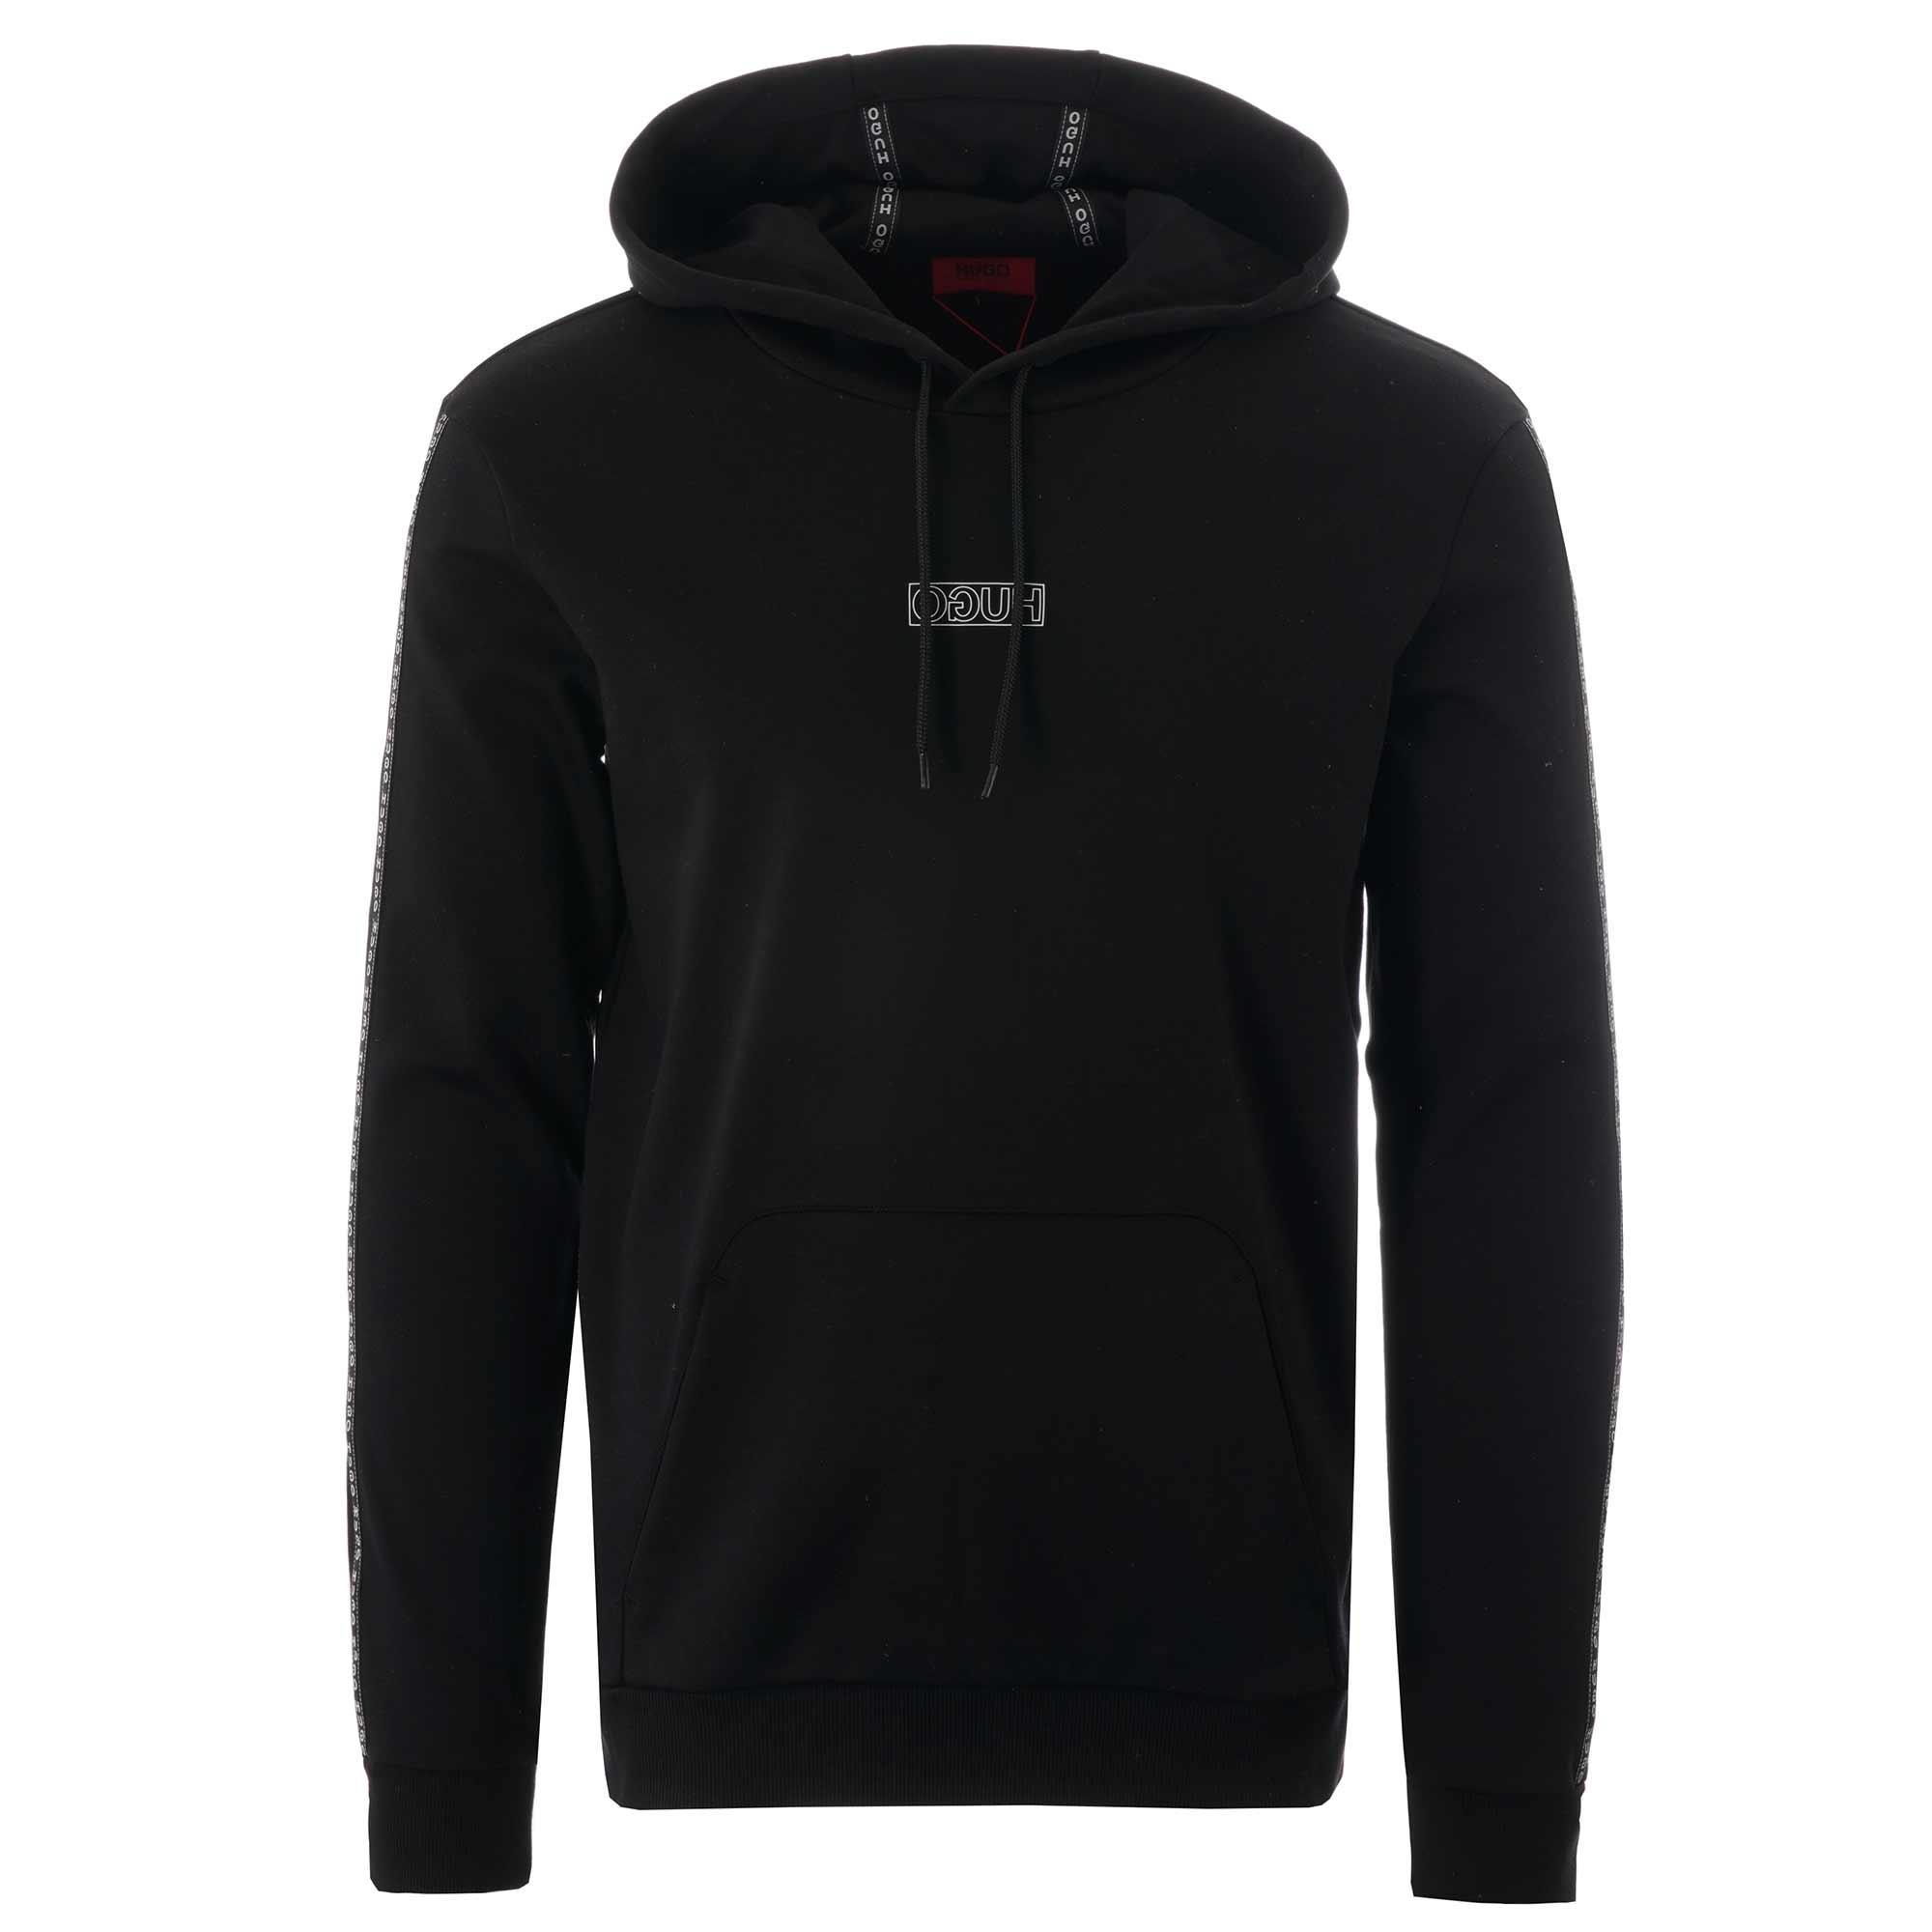 d4bb2180cd74c BOSS Dercolando Hoodie - Black in Black for Men - Lyst